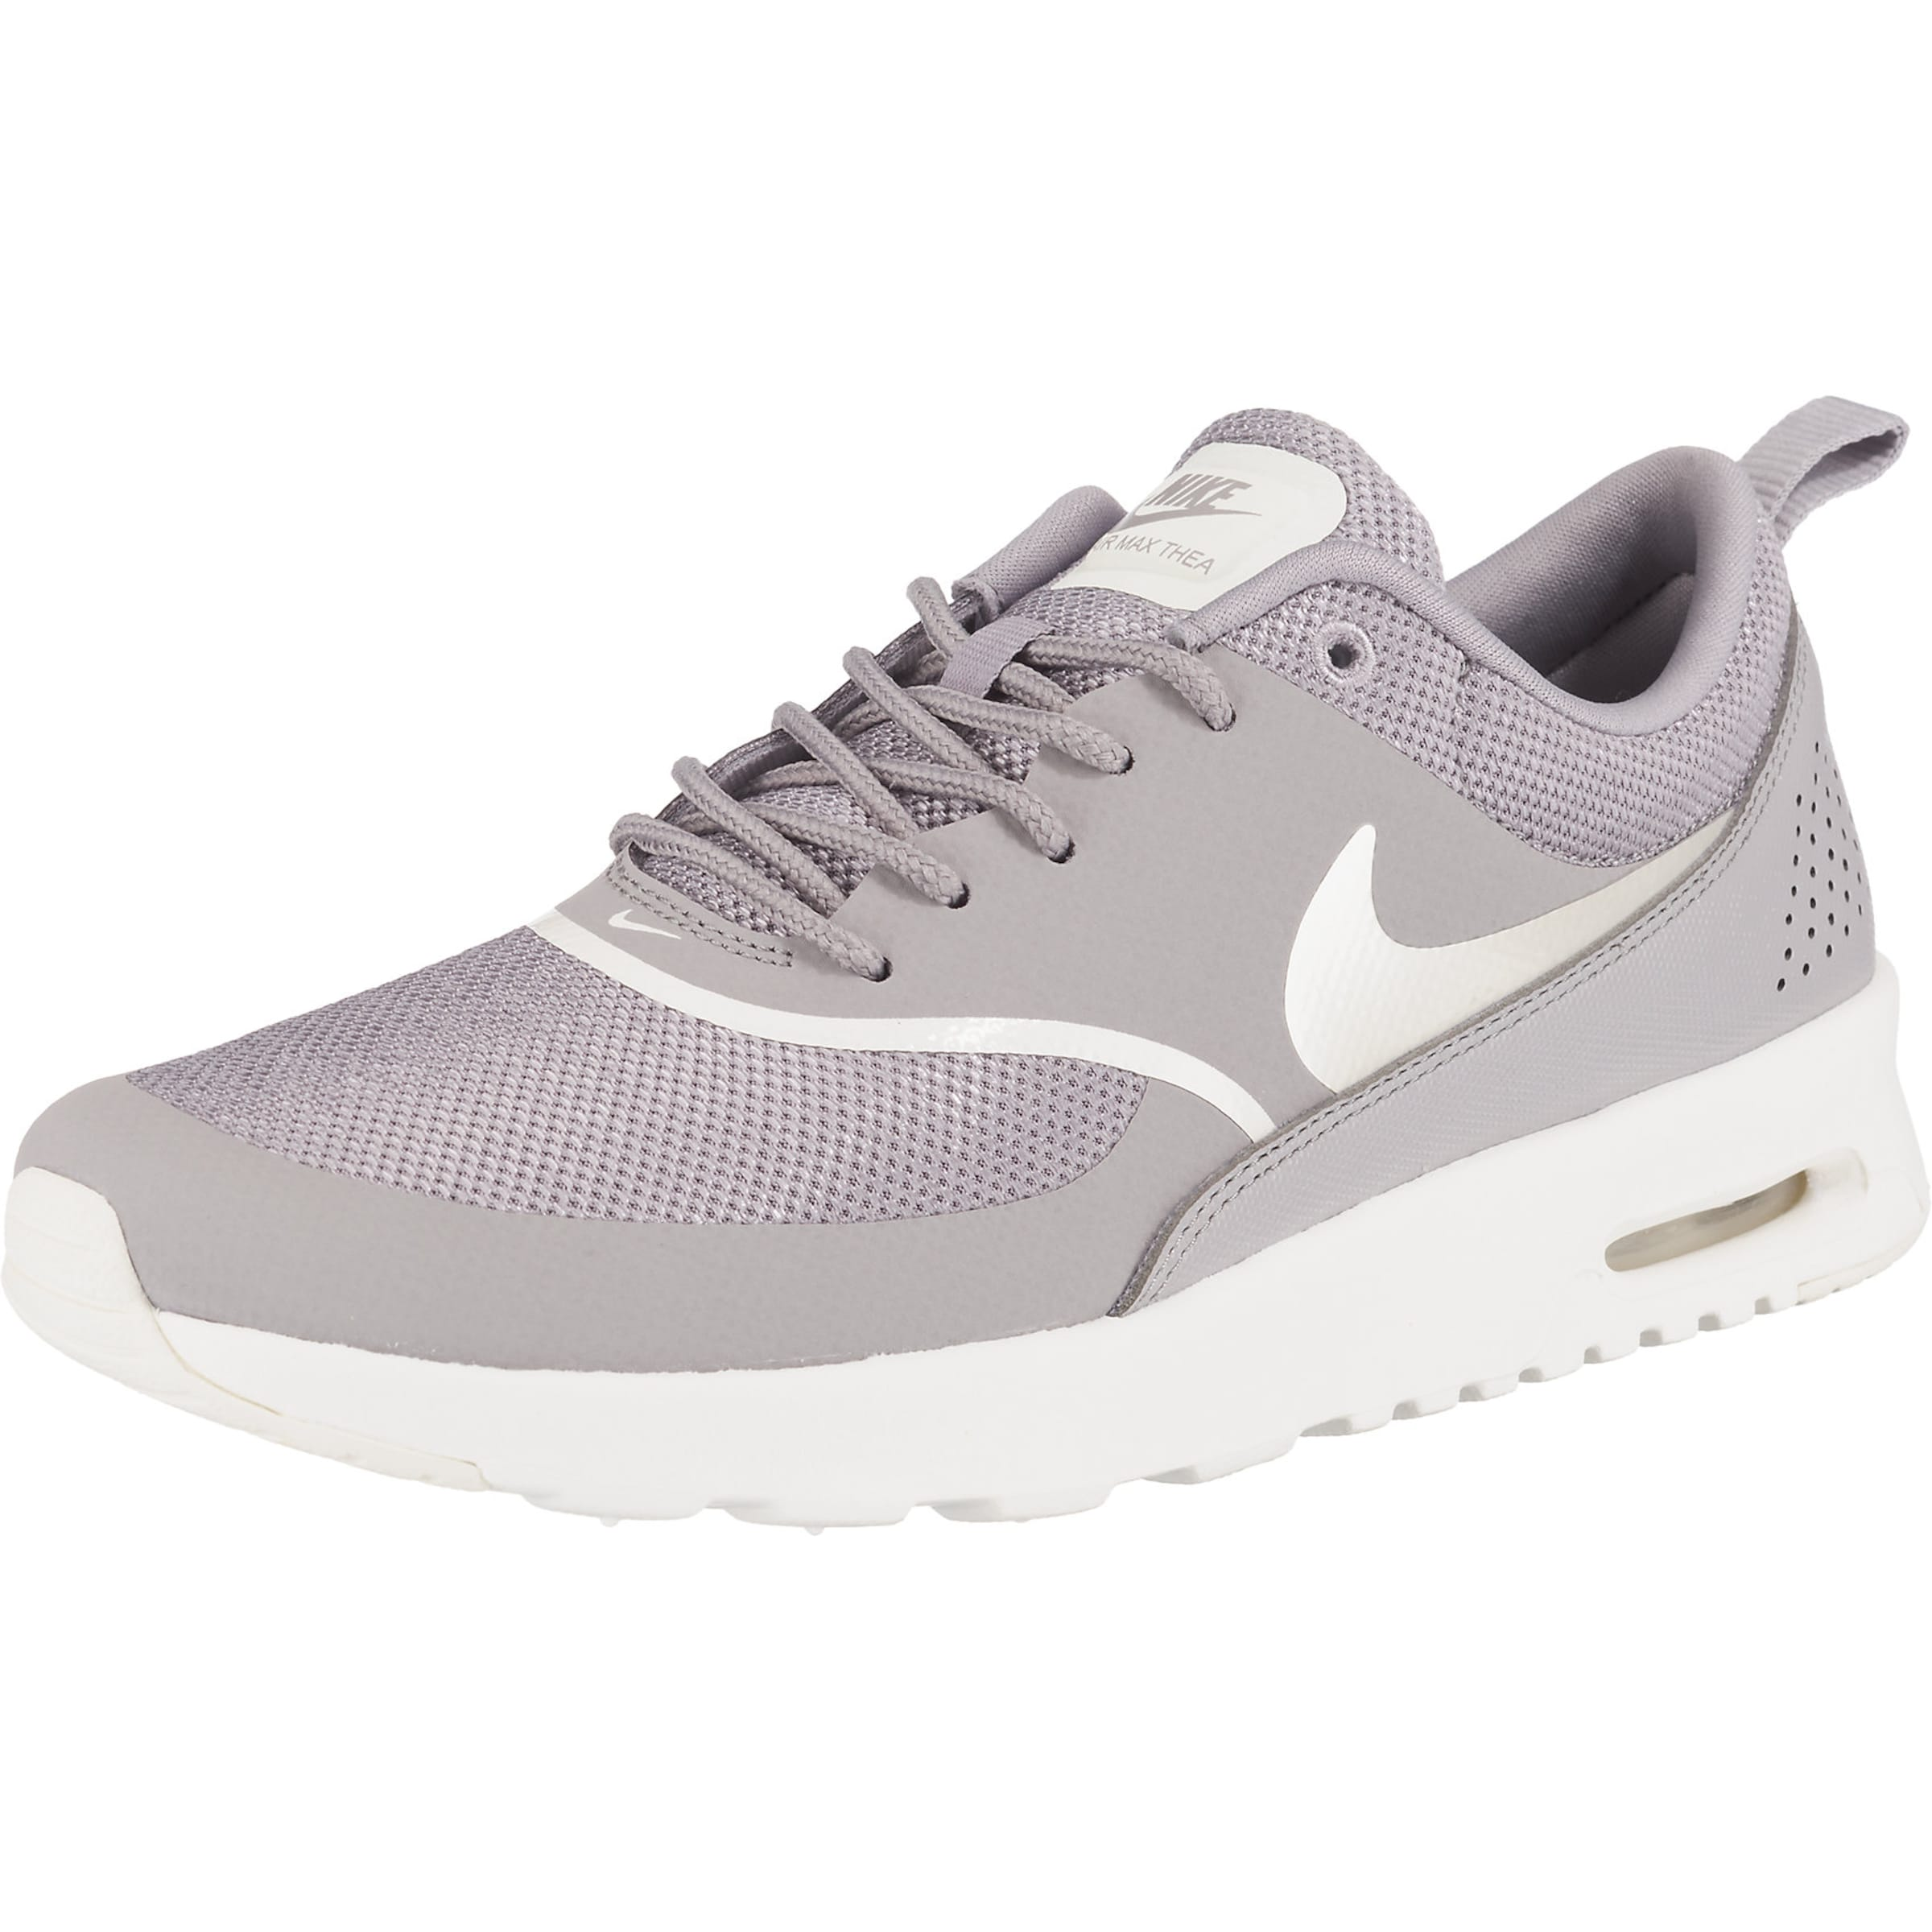 AquaWeiß 'air Thea' Sportswear Max Nike In Sneaker ynmNO8wv0